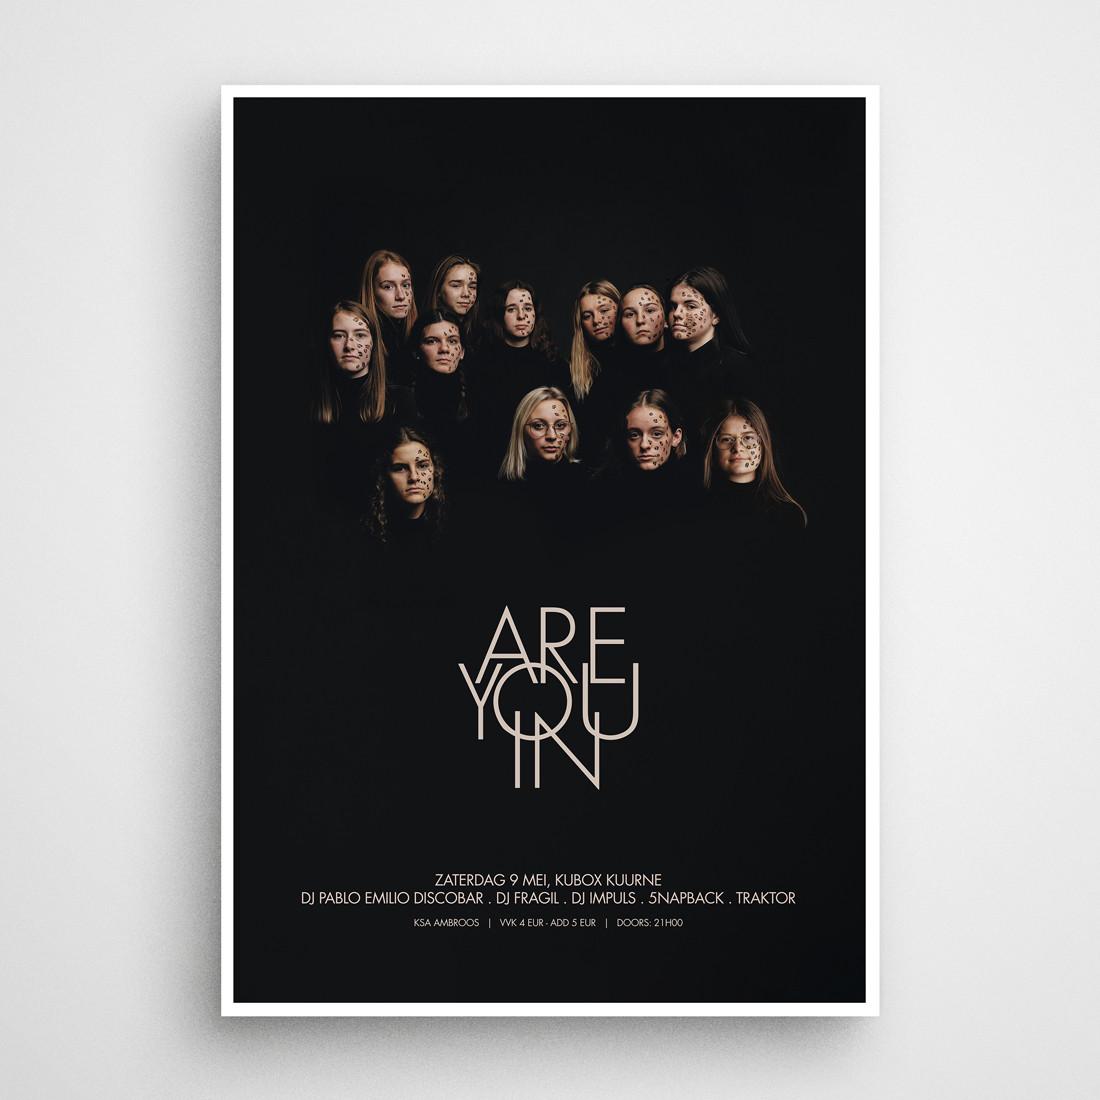 AYI_2020_Poster_01